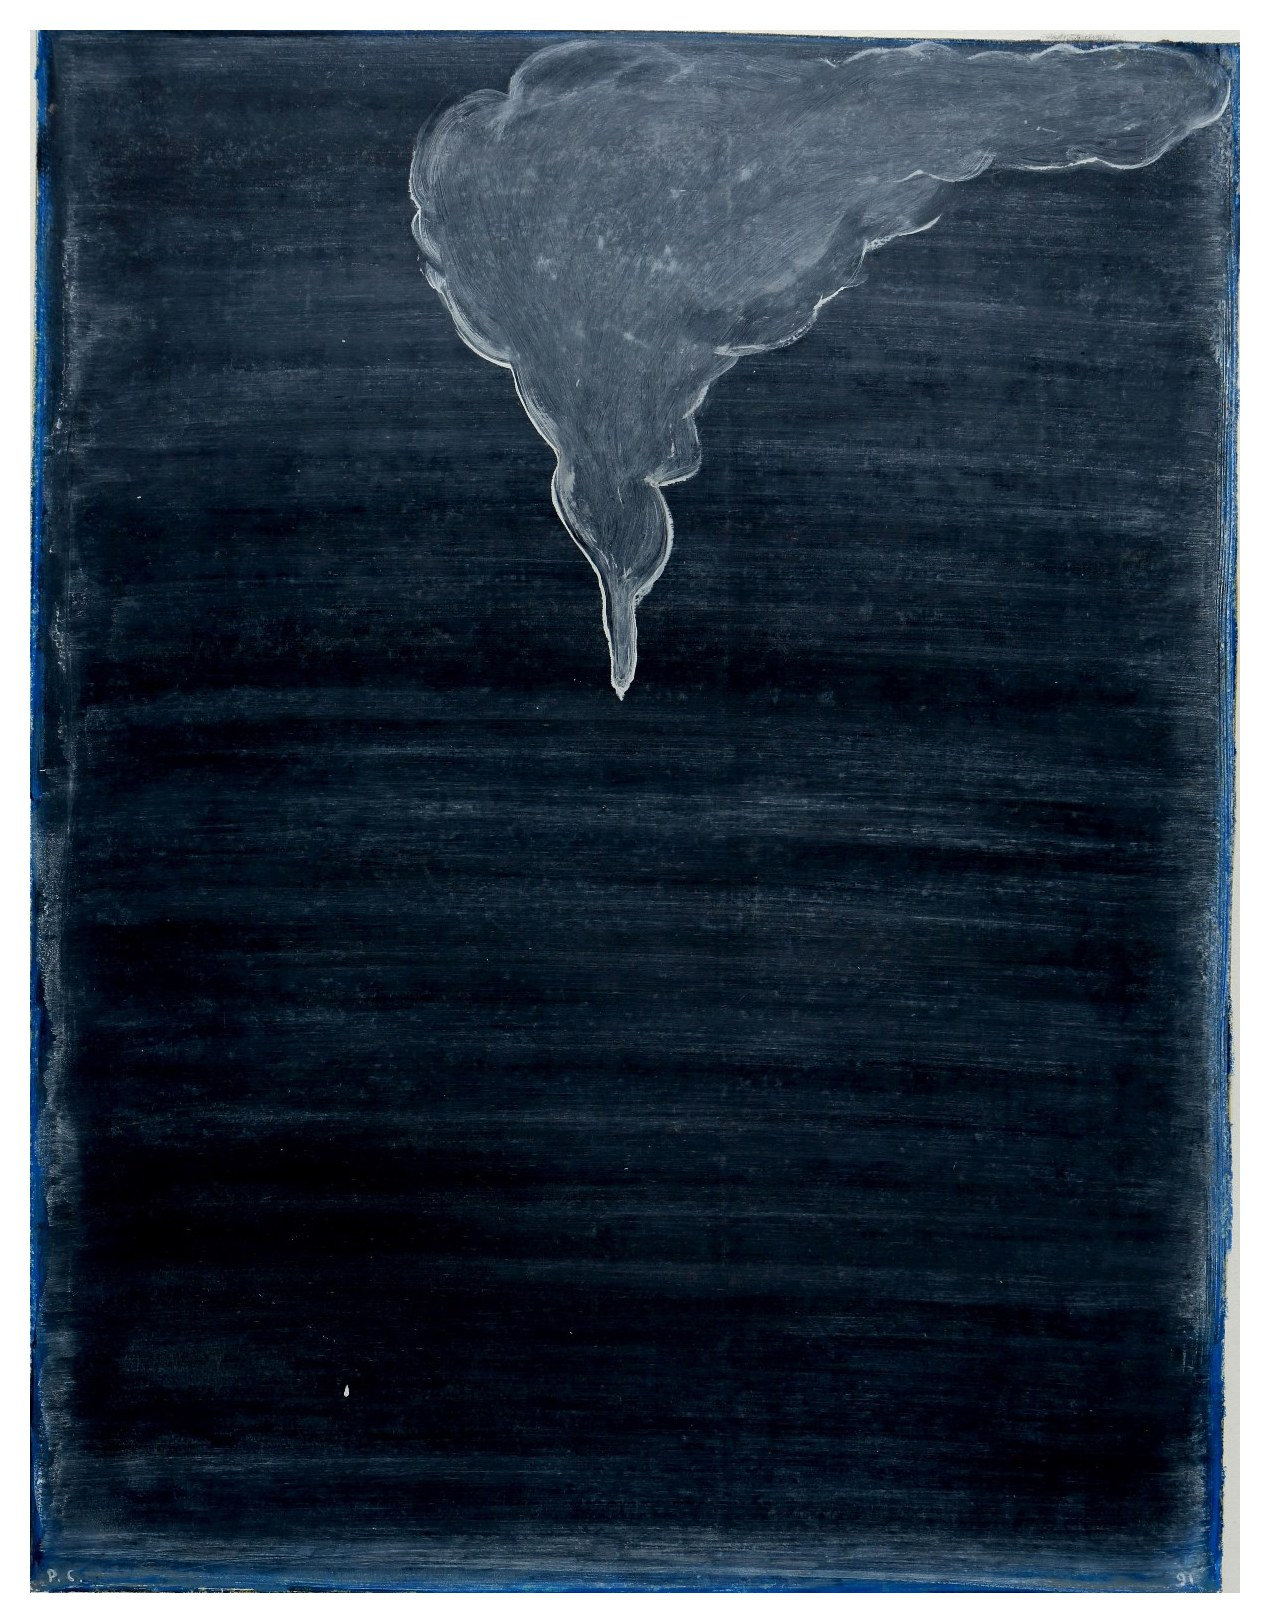 無題 Untitled 2001-2003 油彩、畫紙 70cm x 54cm